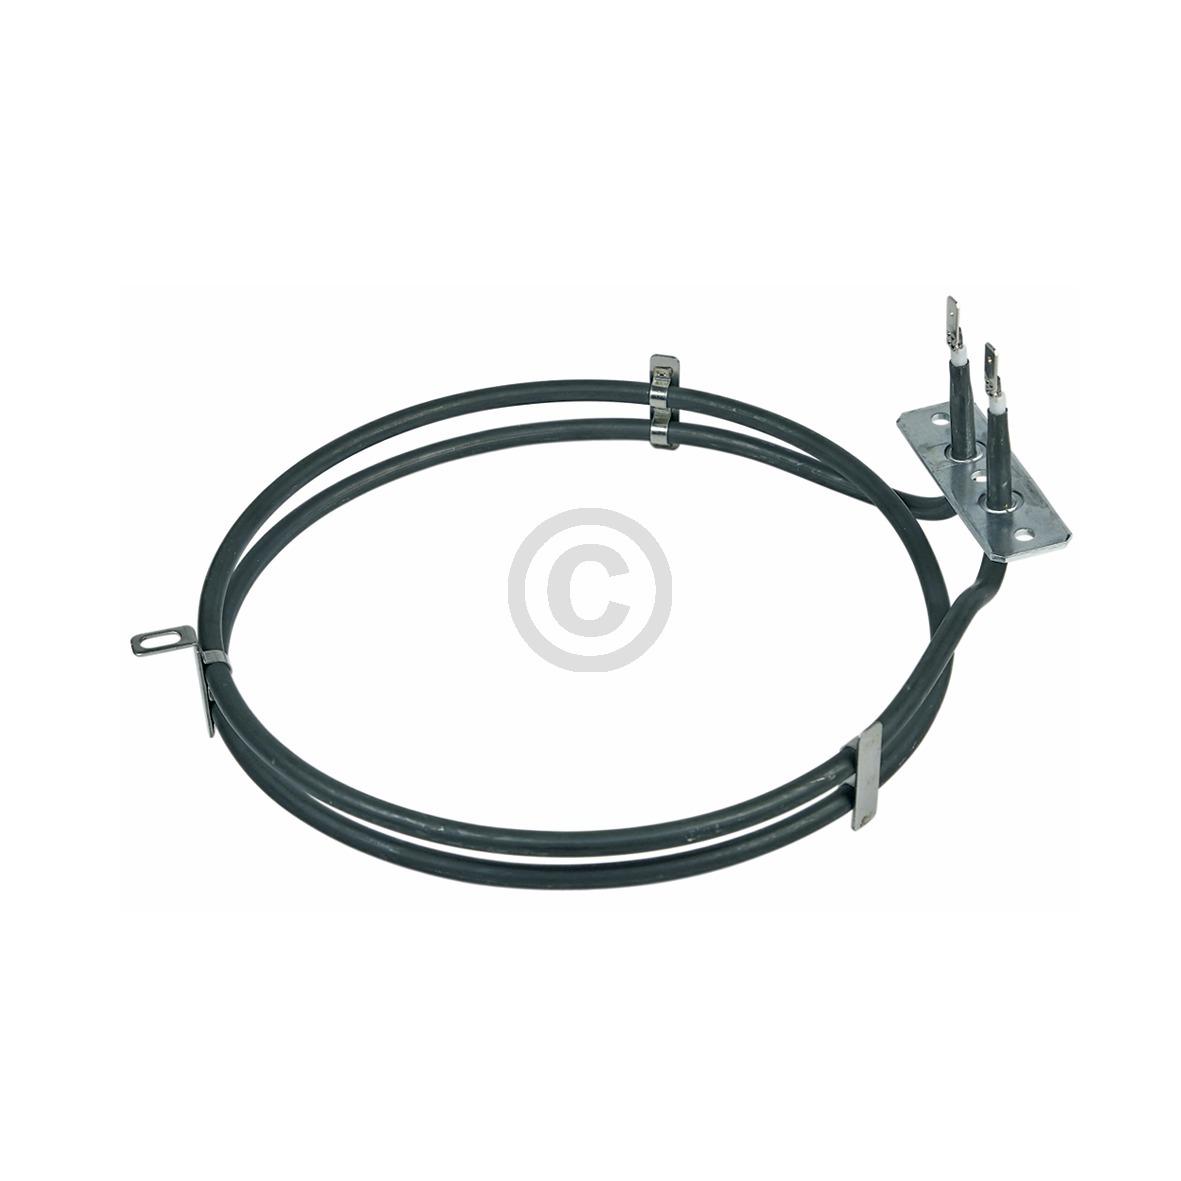 Heizelement Heißluft 2000W 230V, AT! 480121101186 Bauknecht, Whirlpool, Ikea